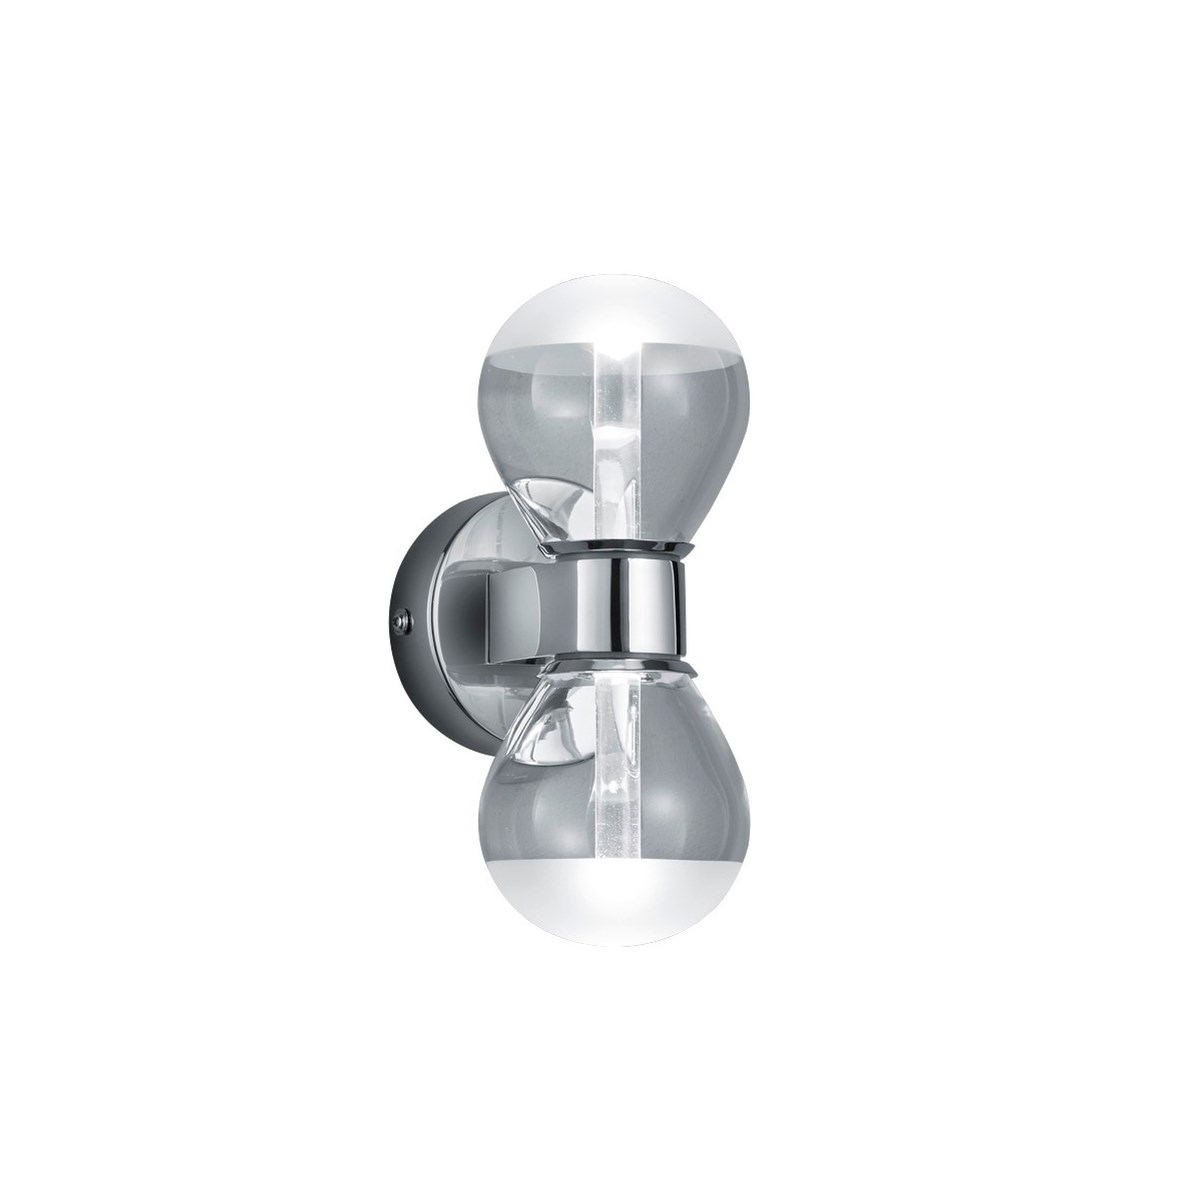 H2O 2 Light Bulb Wall Sconce in Chrome